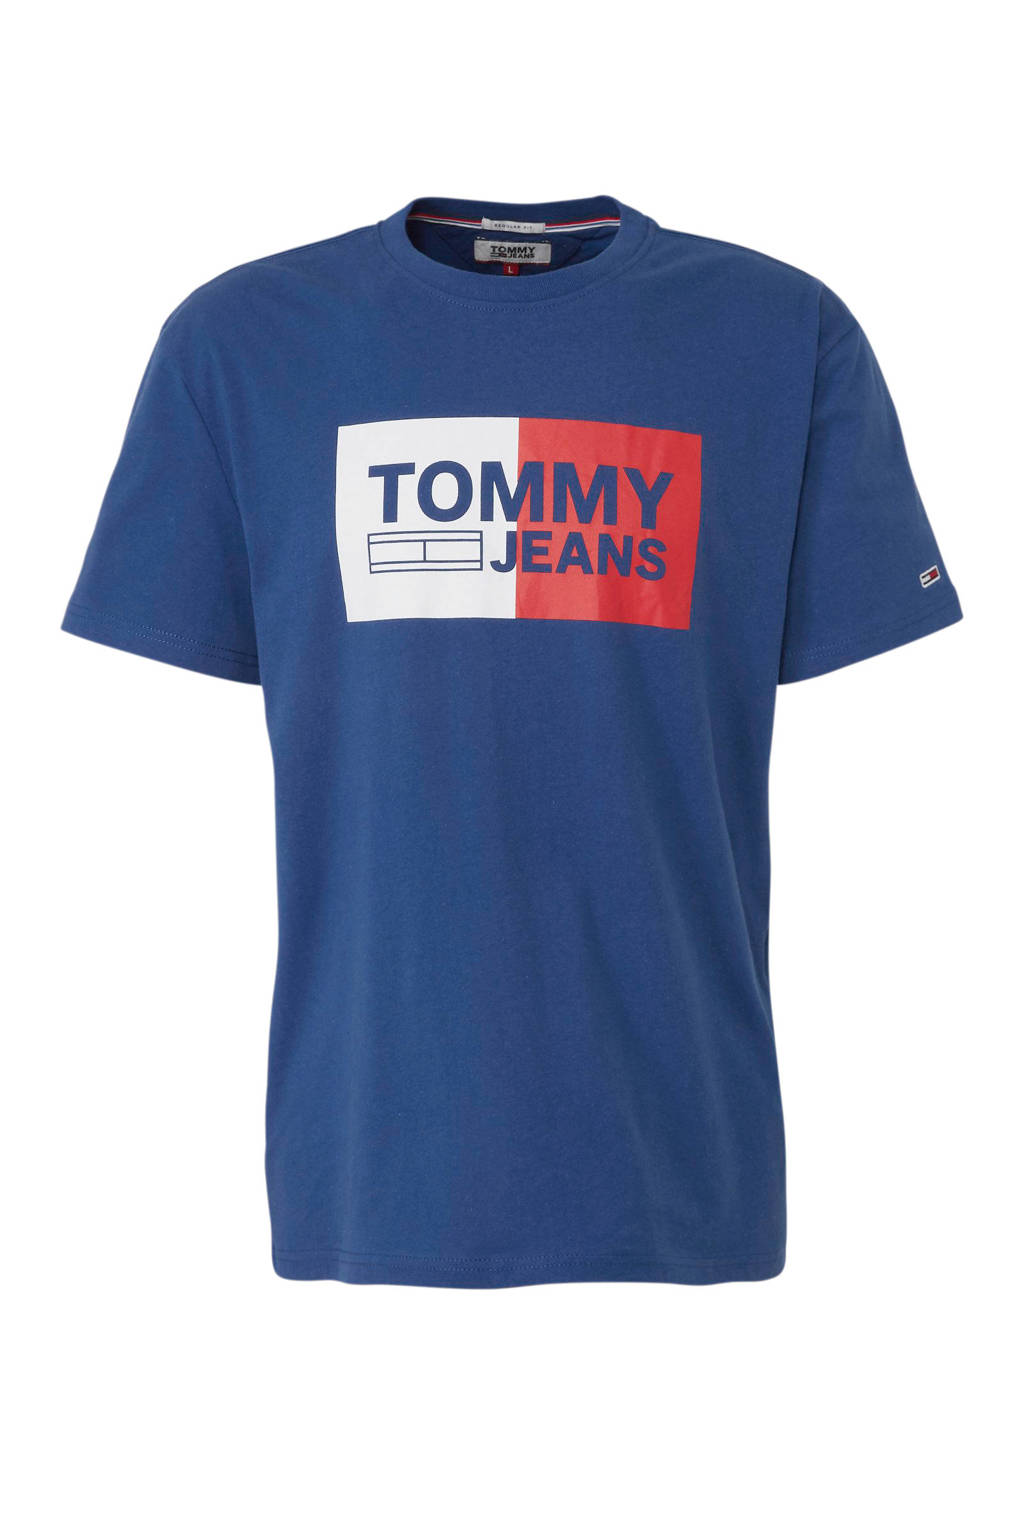 Tommy Jeans T-shirt met printopdruk blauw, Blauw/ wit/ rood